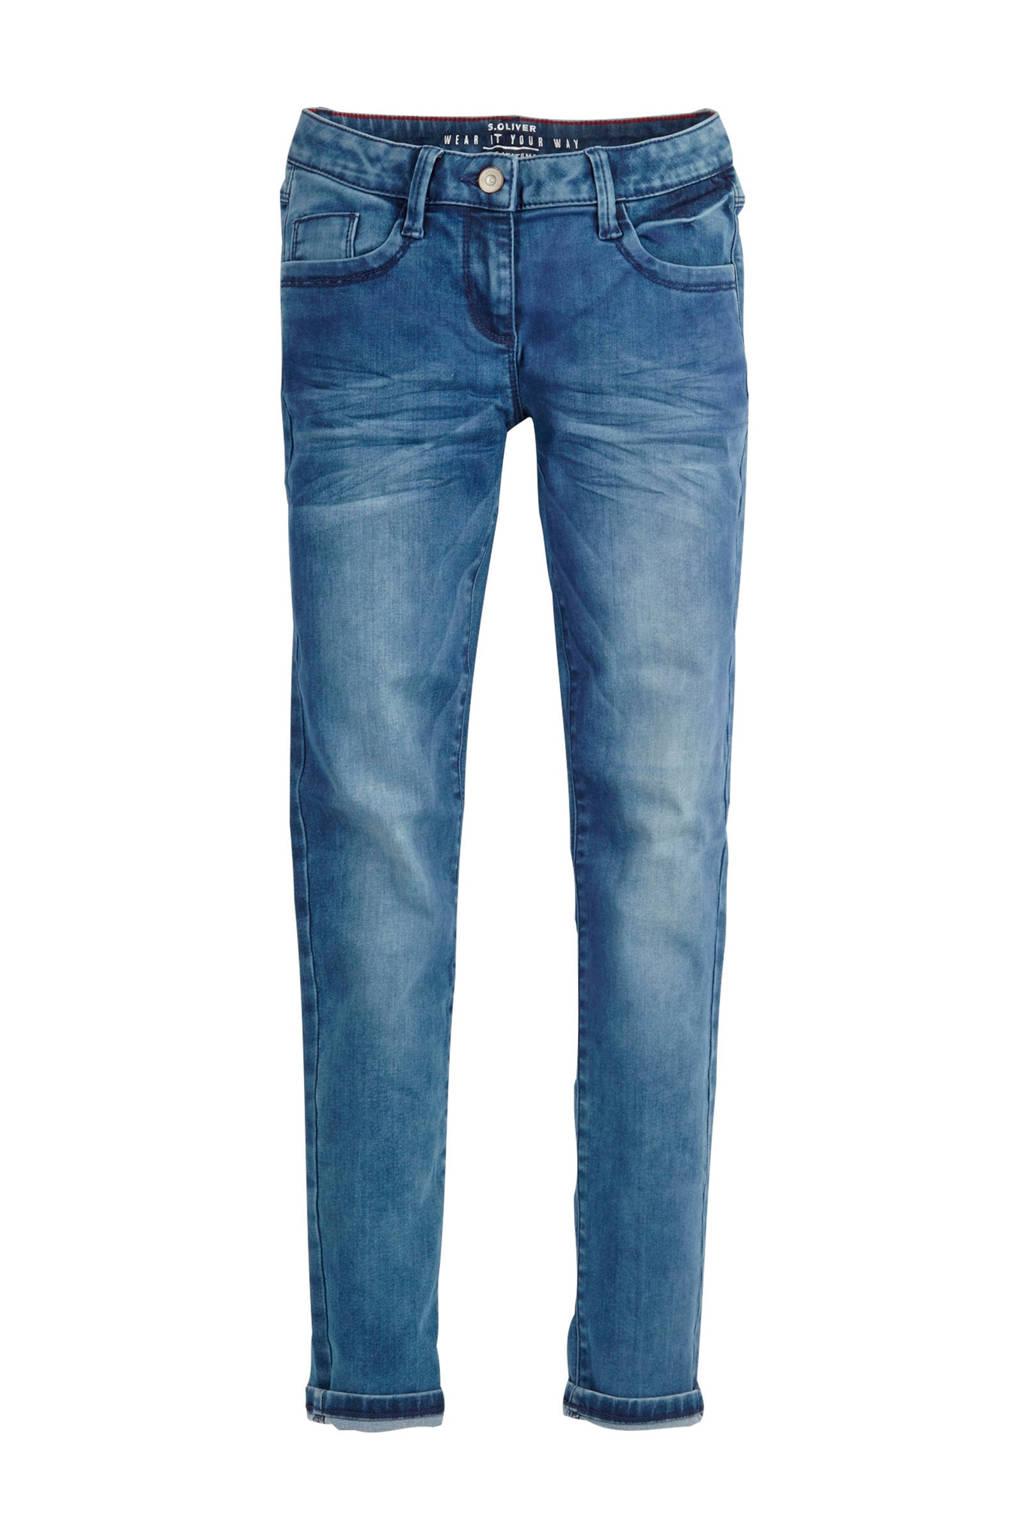 s.Oliver skinny jeans light denim, Light denim